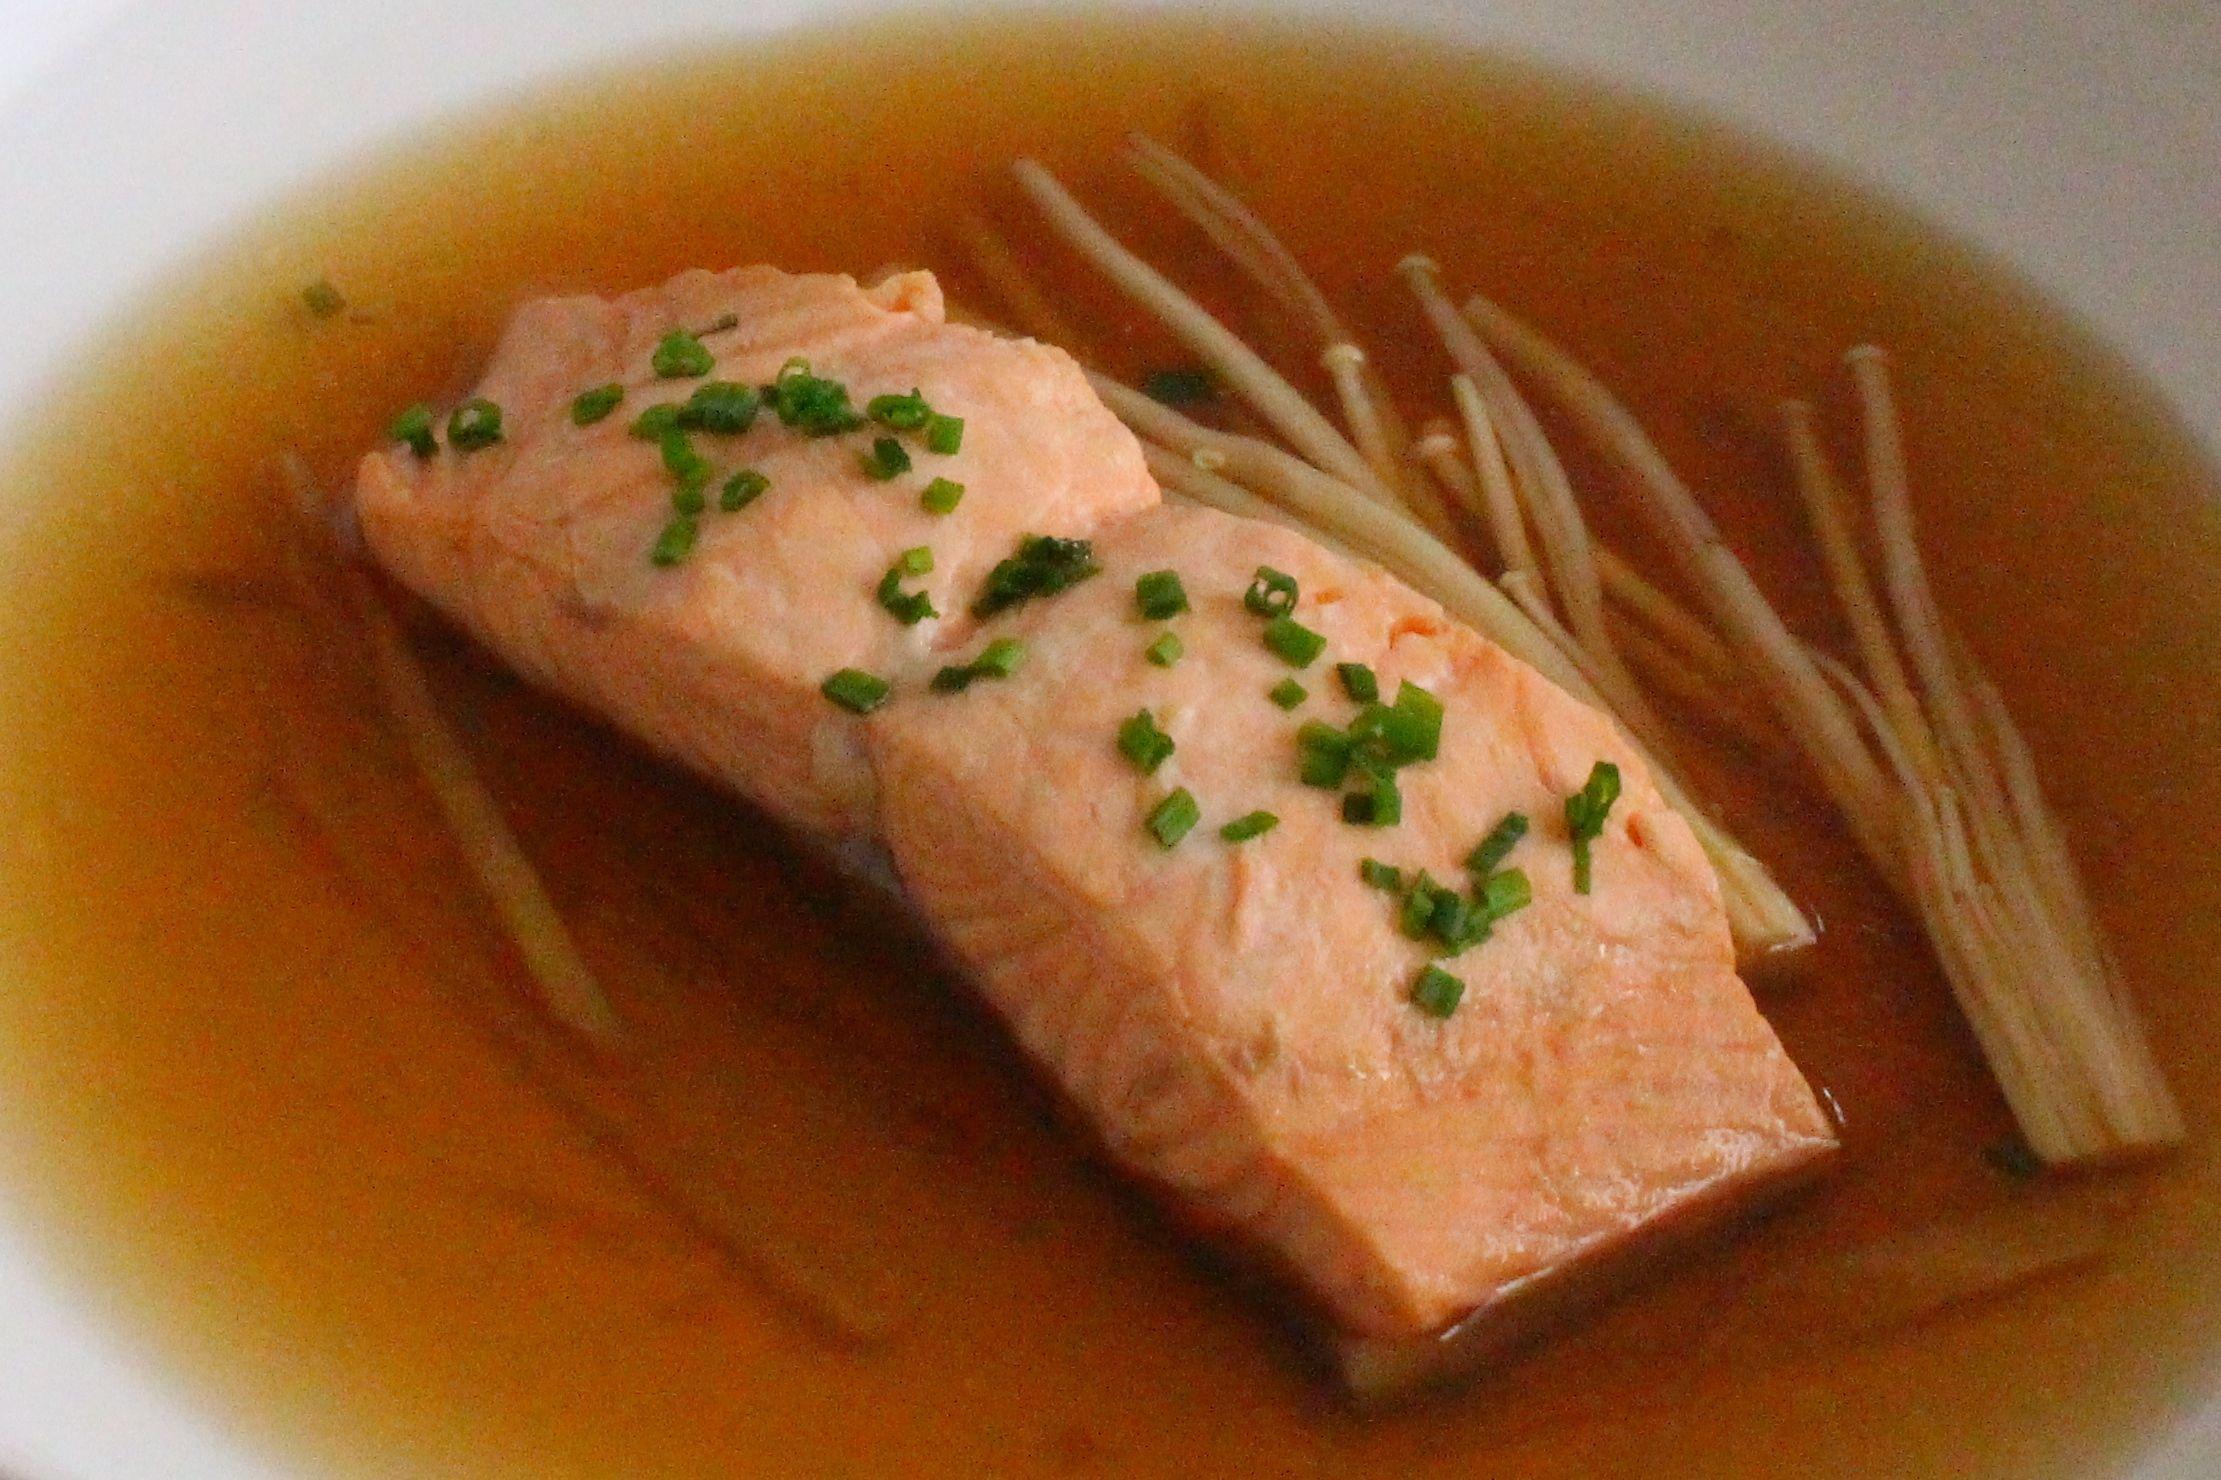 Dashi evokes an underwater quality that matches its subtle briny taste